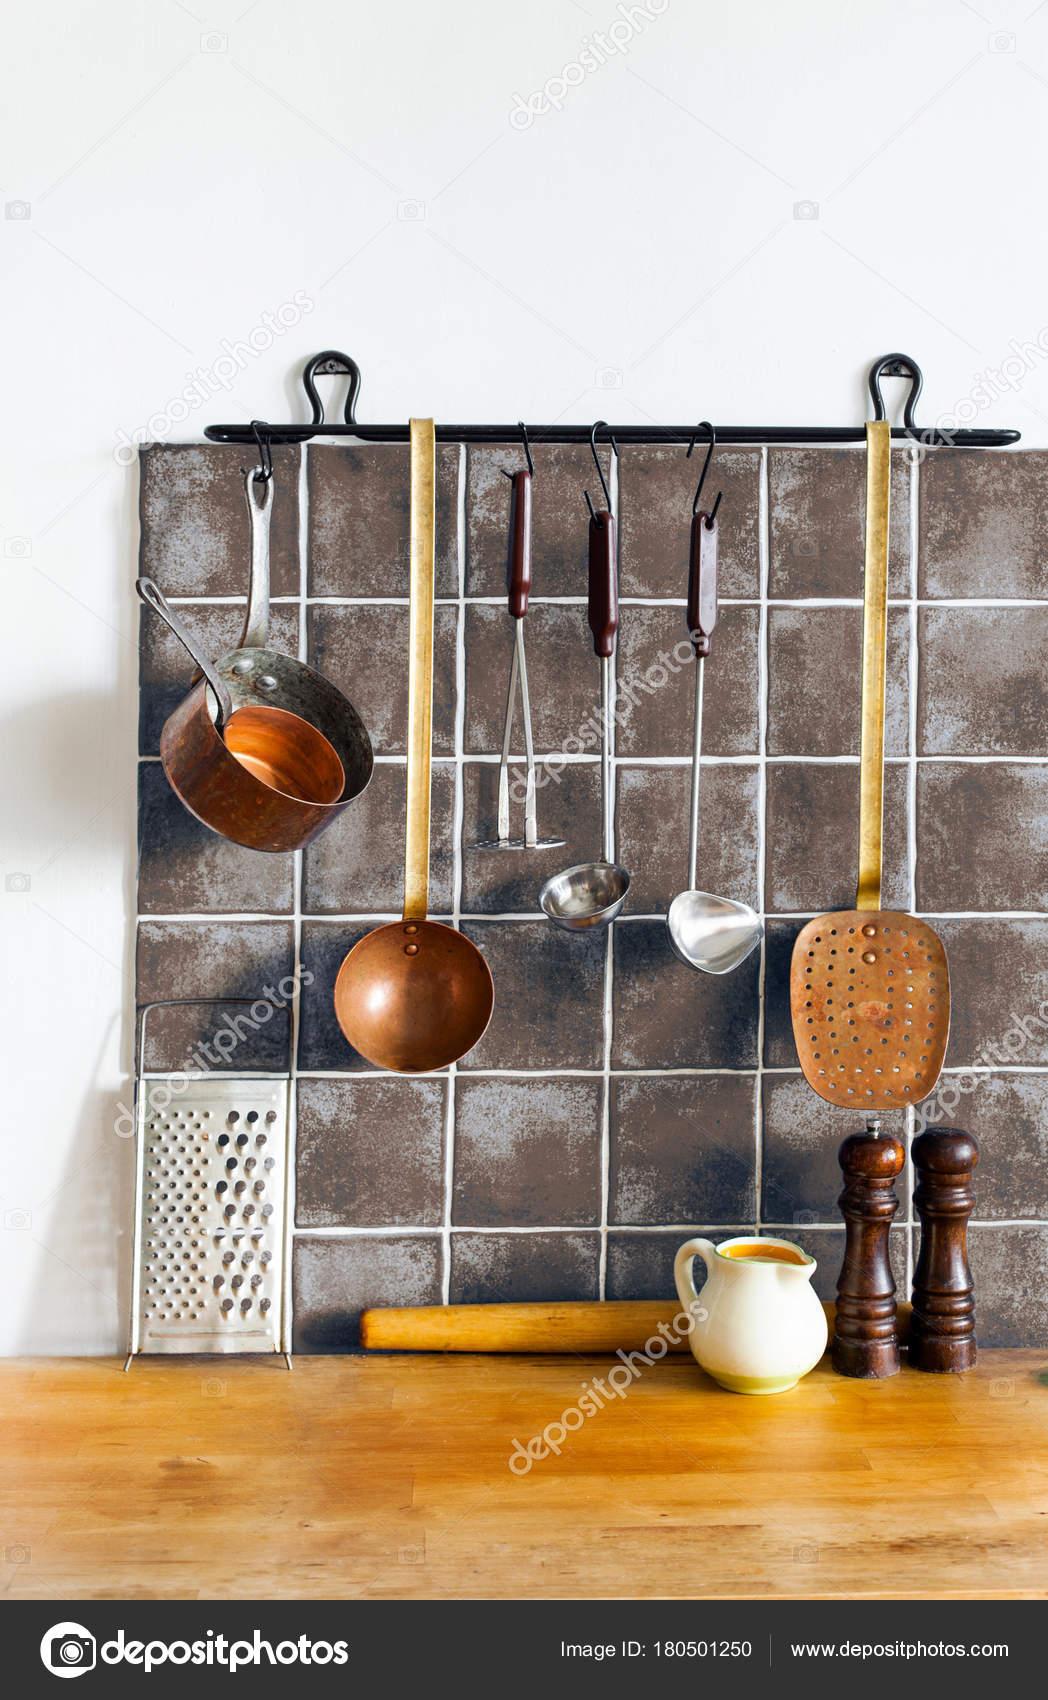 retro kitchen tables blender 复古厨房仍然生活内部 黄铜器皿 厨师配件 挂铜厨具套装 勺子 撇 刨 挂铜厨具